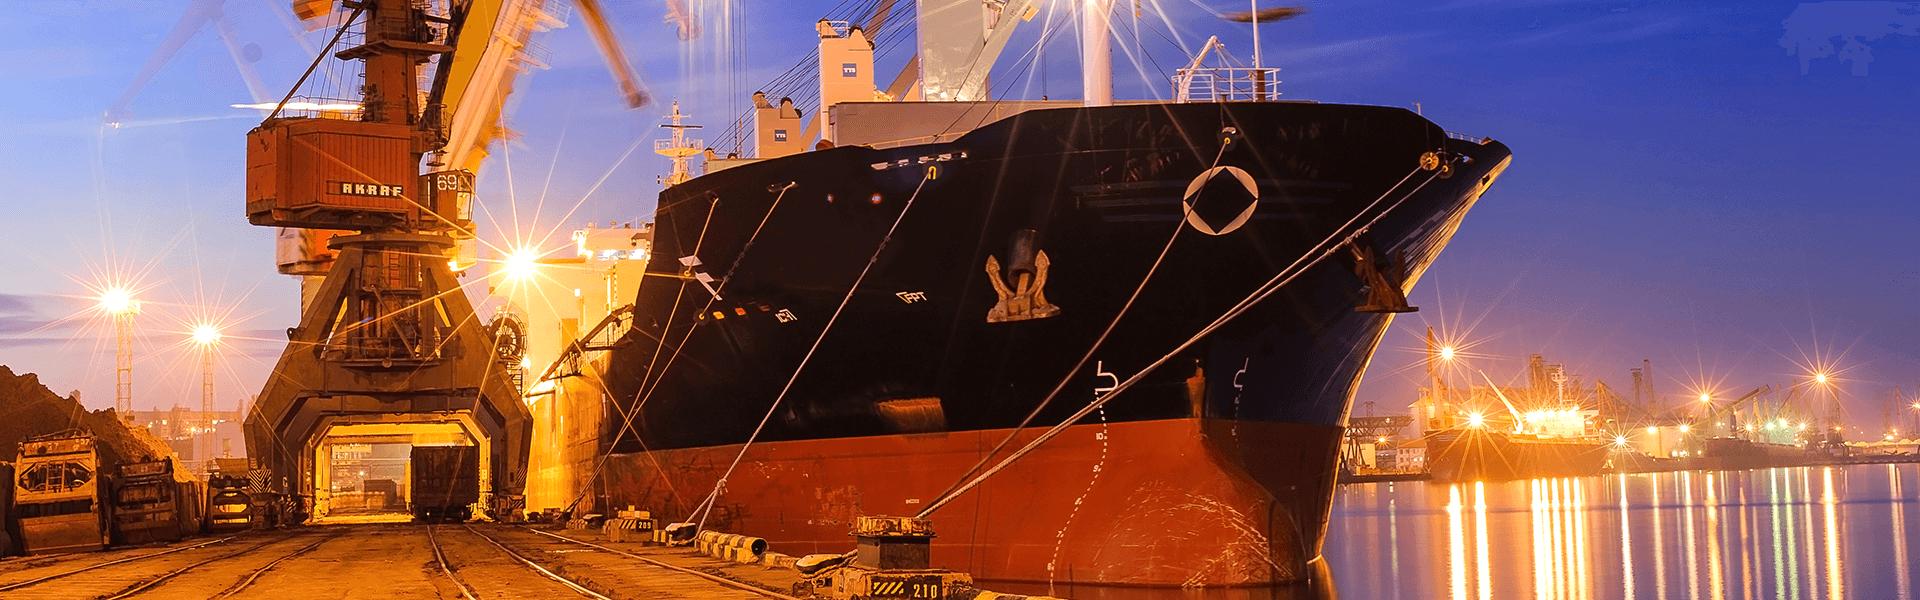 Cargo ship at dock